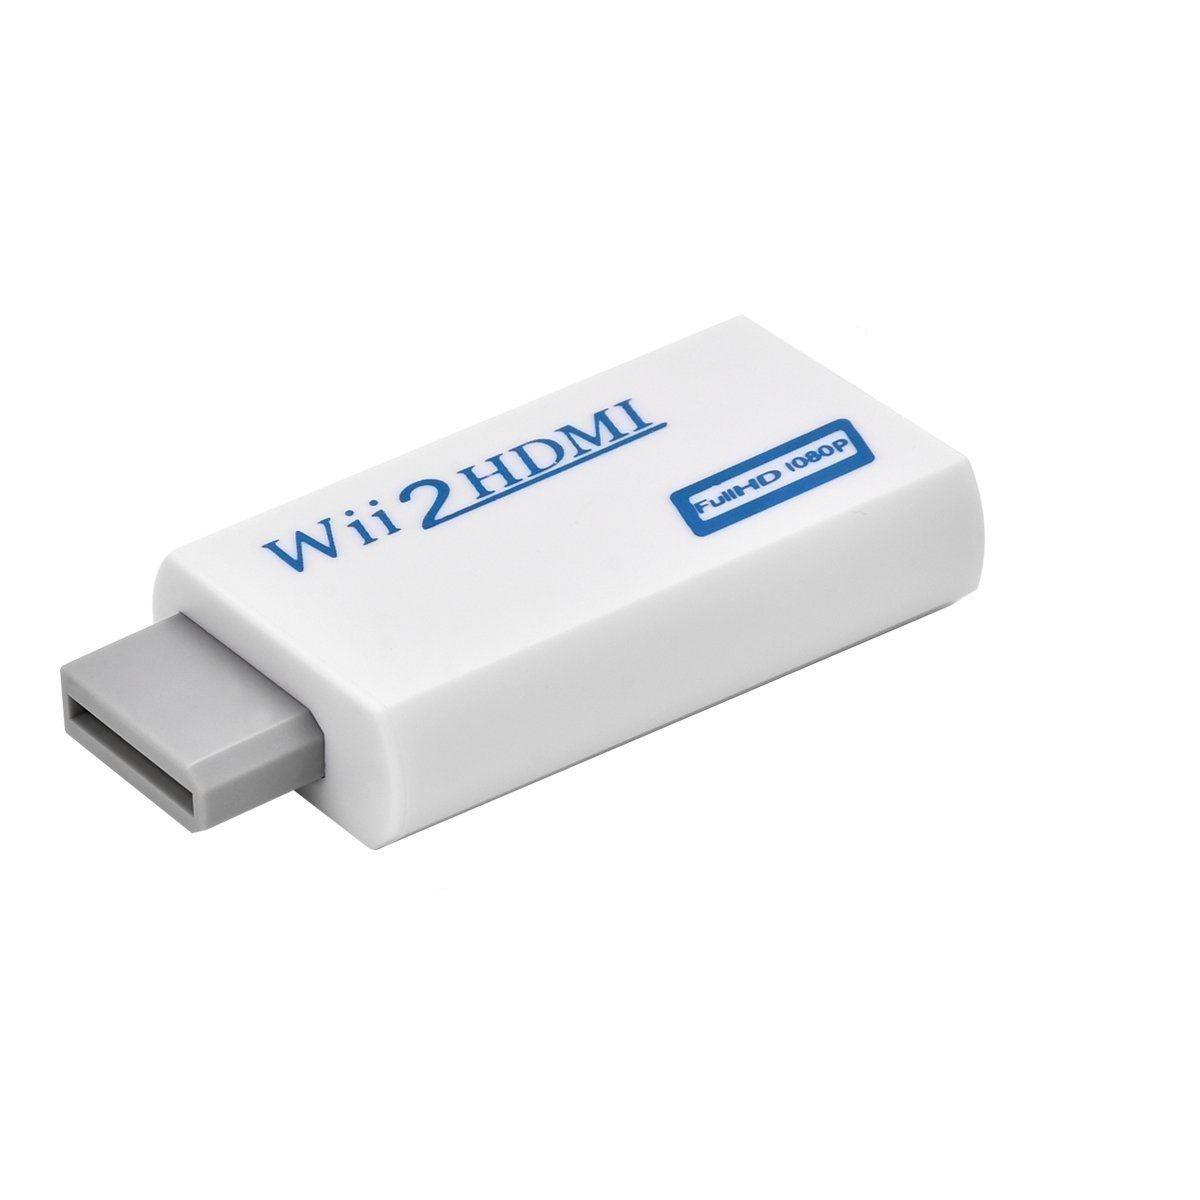 Item Nintendo Wii ADAPTER HDMI ADAPTER + AUDIO